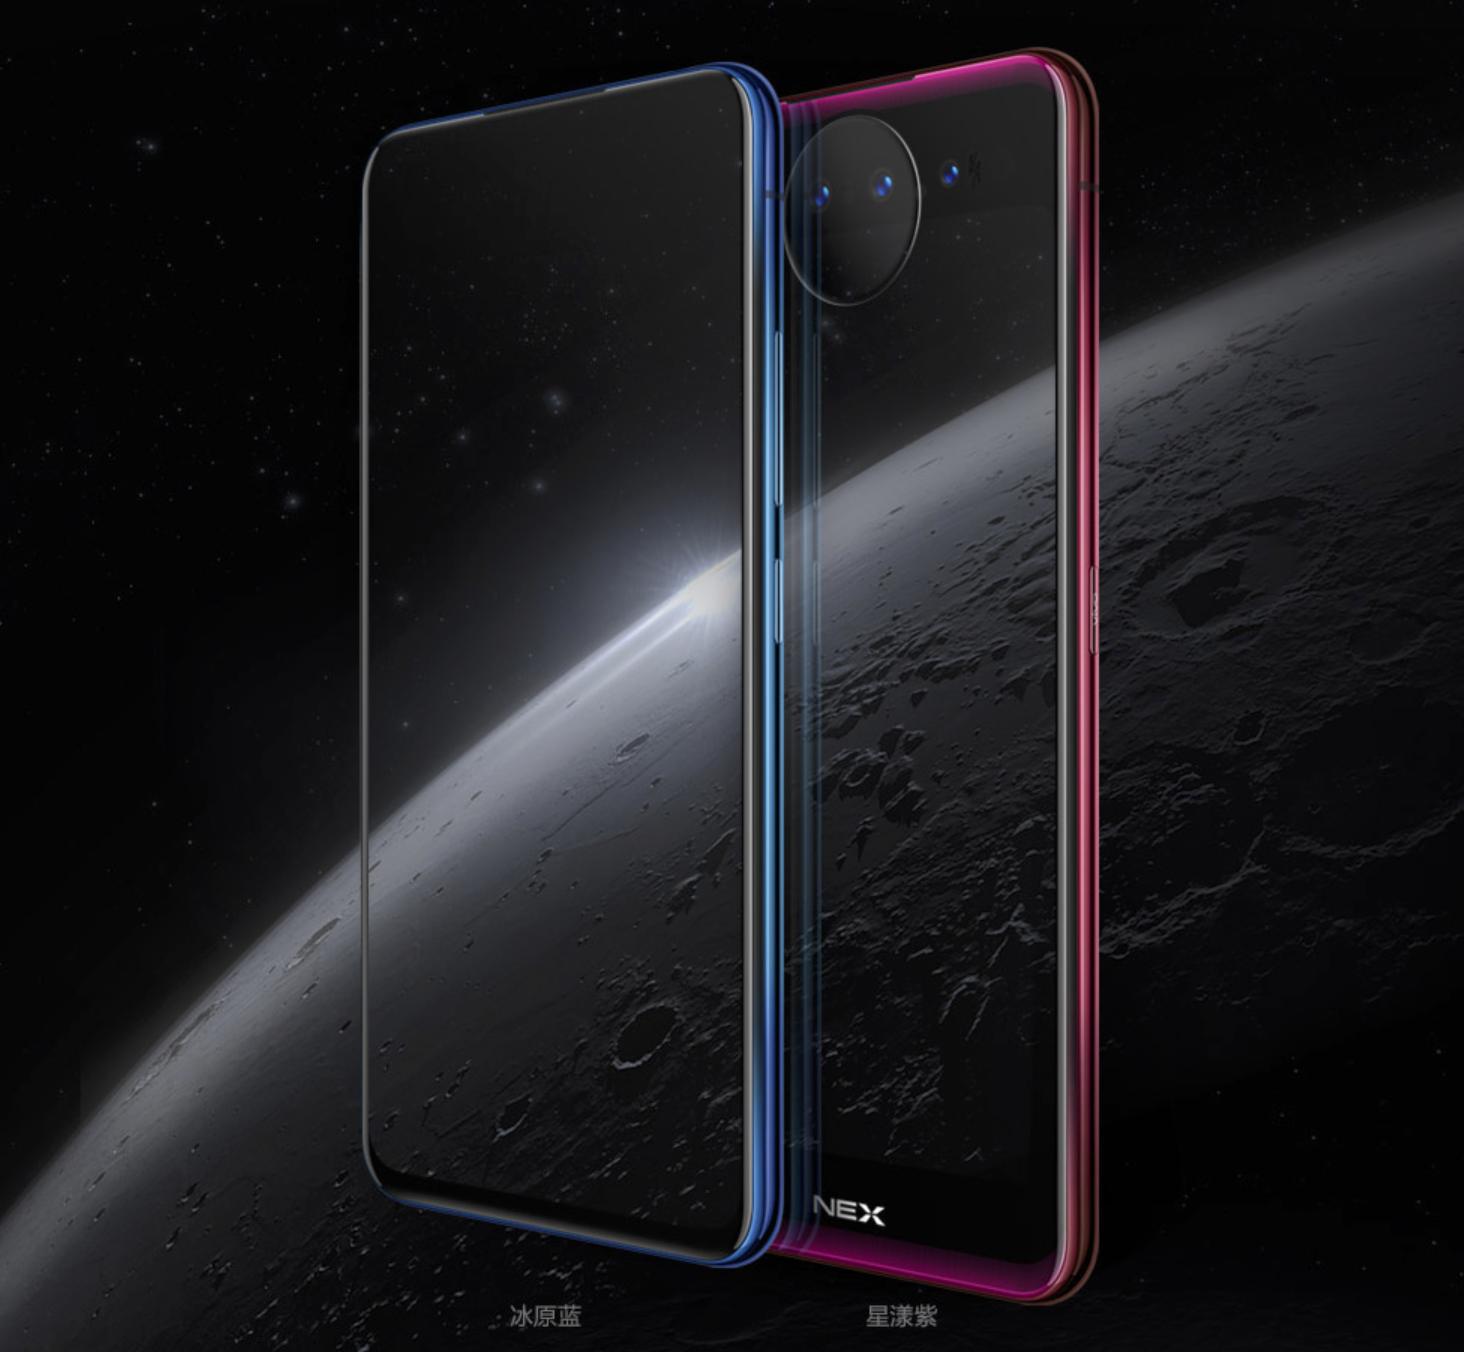 Vivo NEX Dual screen hands on